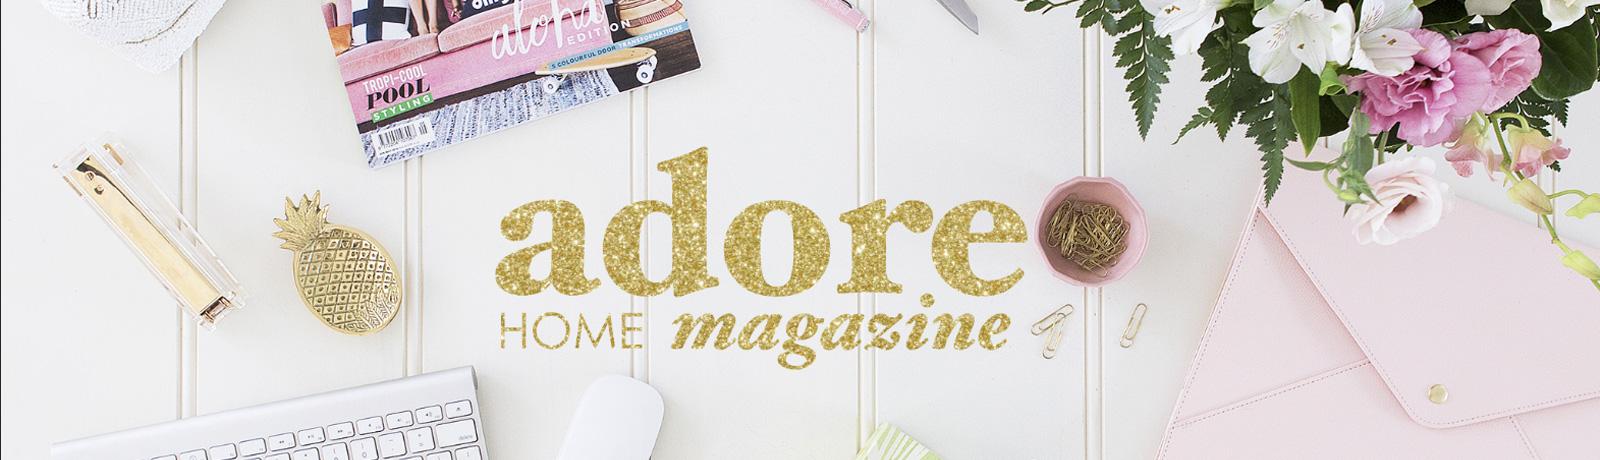 Blog_Webbanner_AdoreMag17_SUMHome